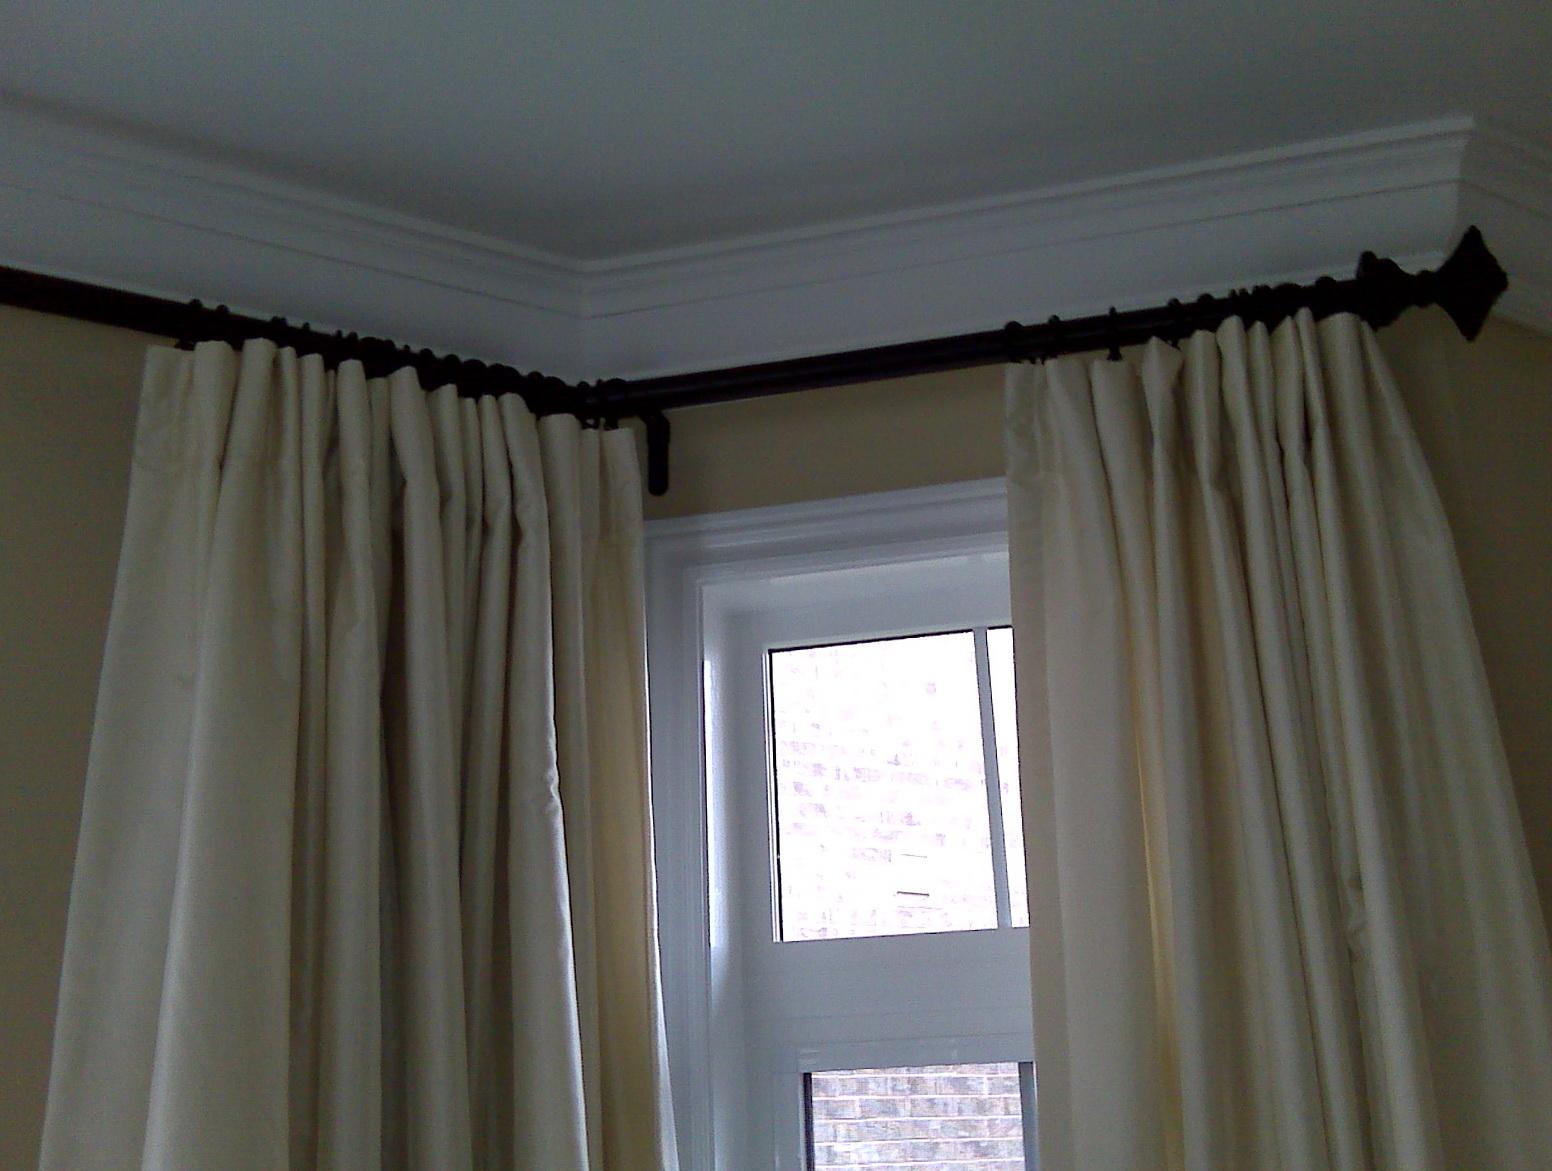 Cambria curtain rod